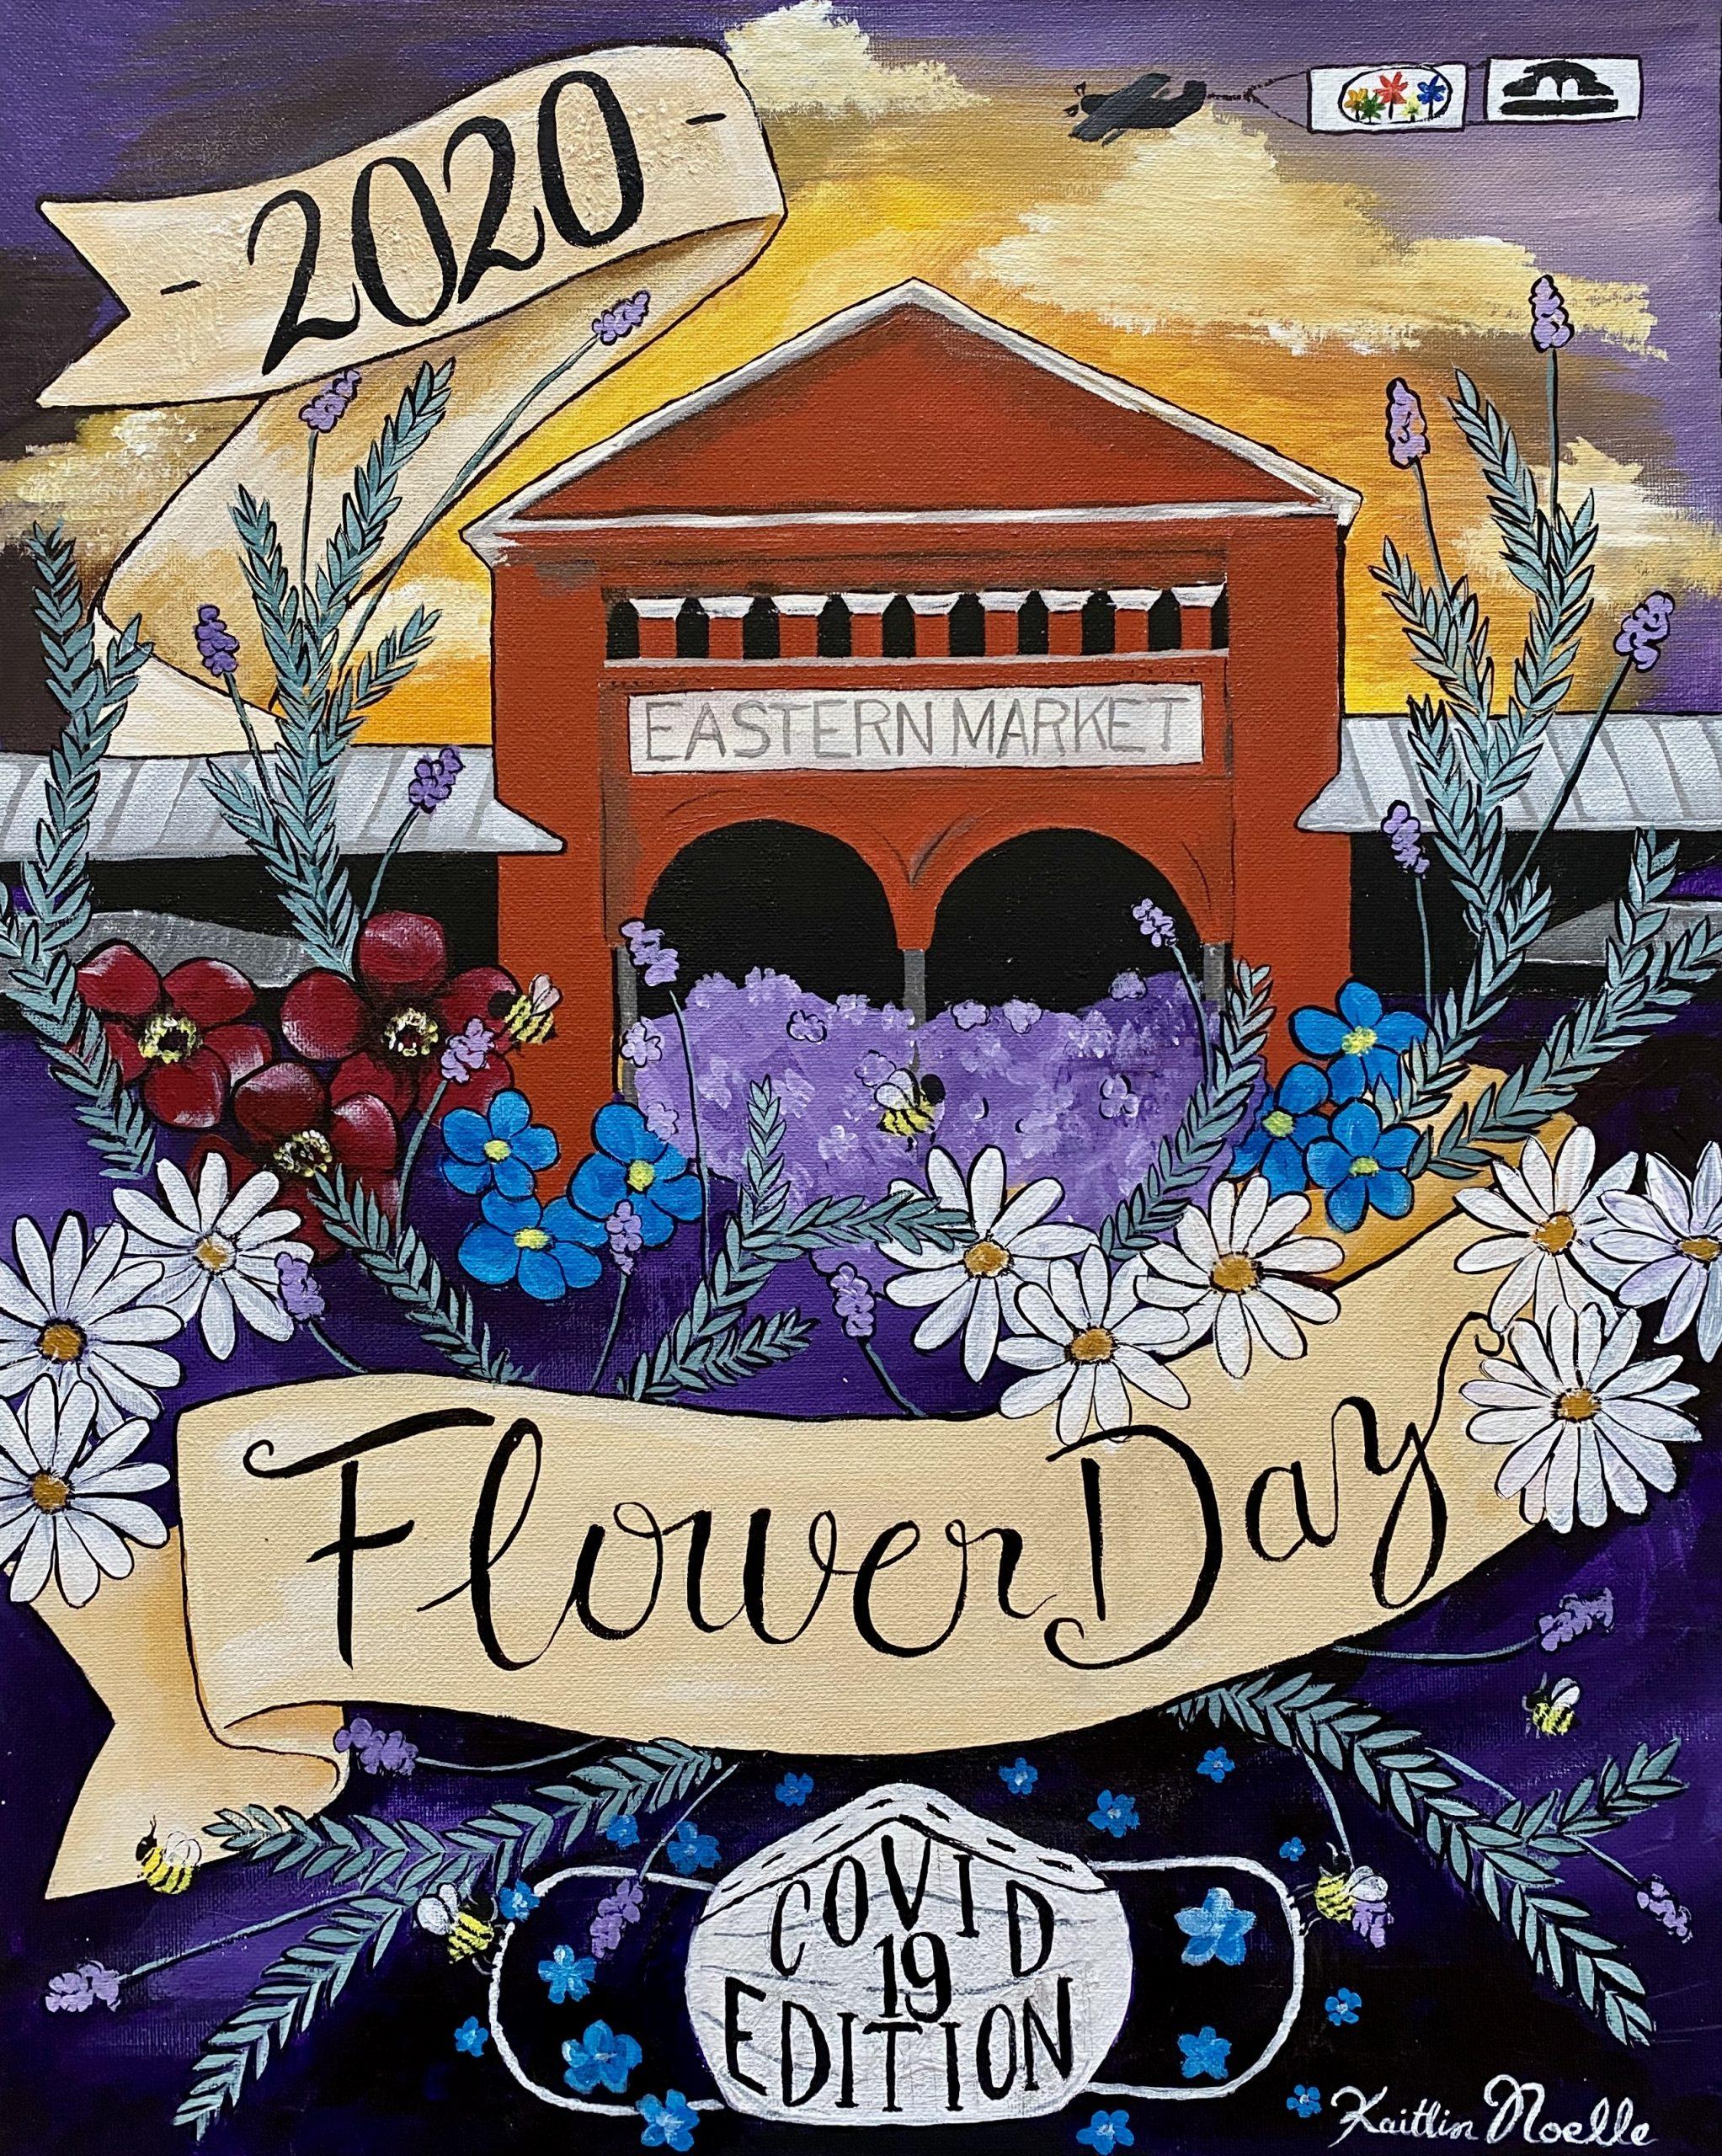 2020 Flower Day